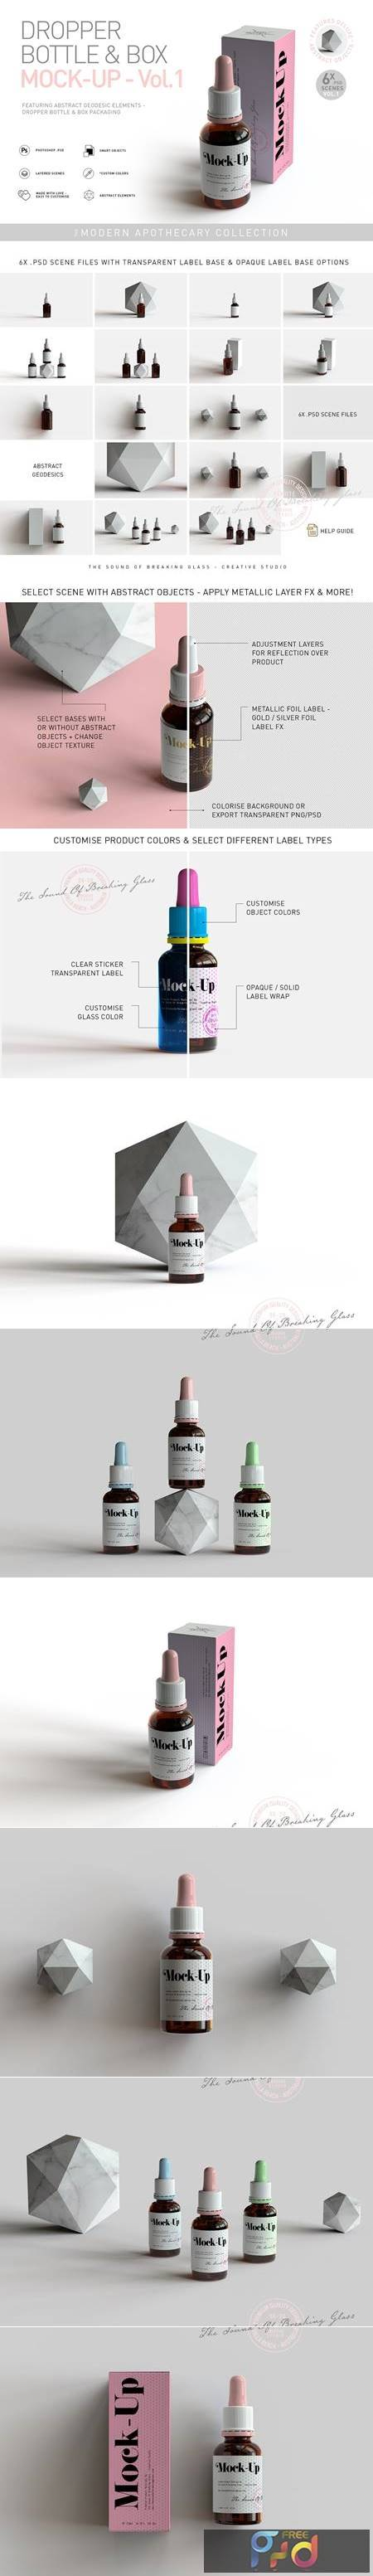 Dropper Bottle & Box Mock-Up - Vol.1 5295550 1